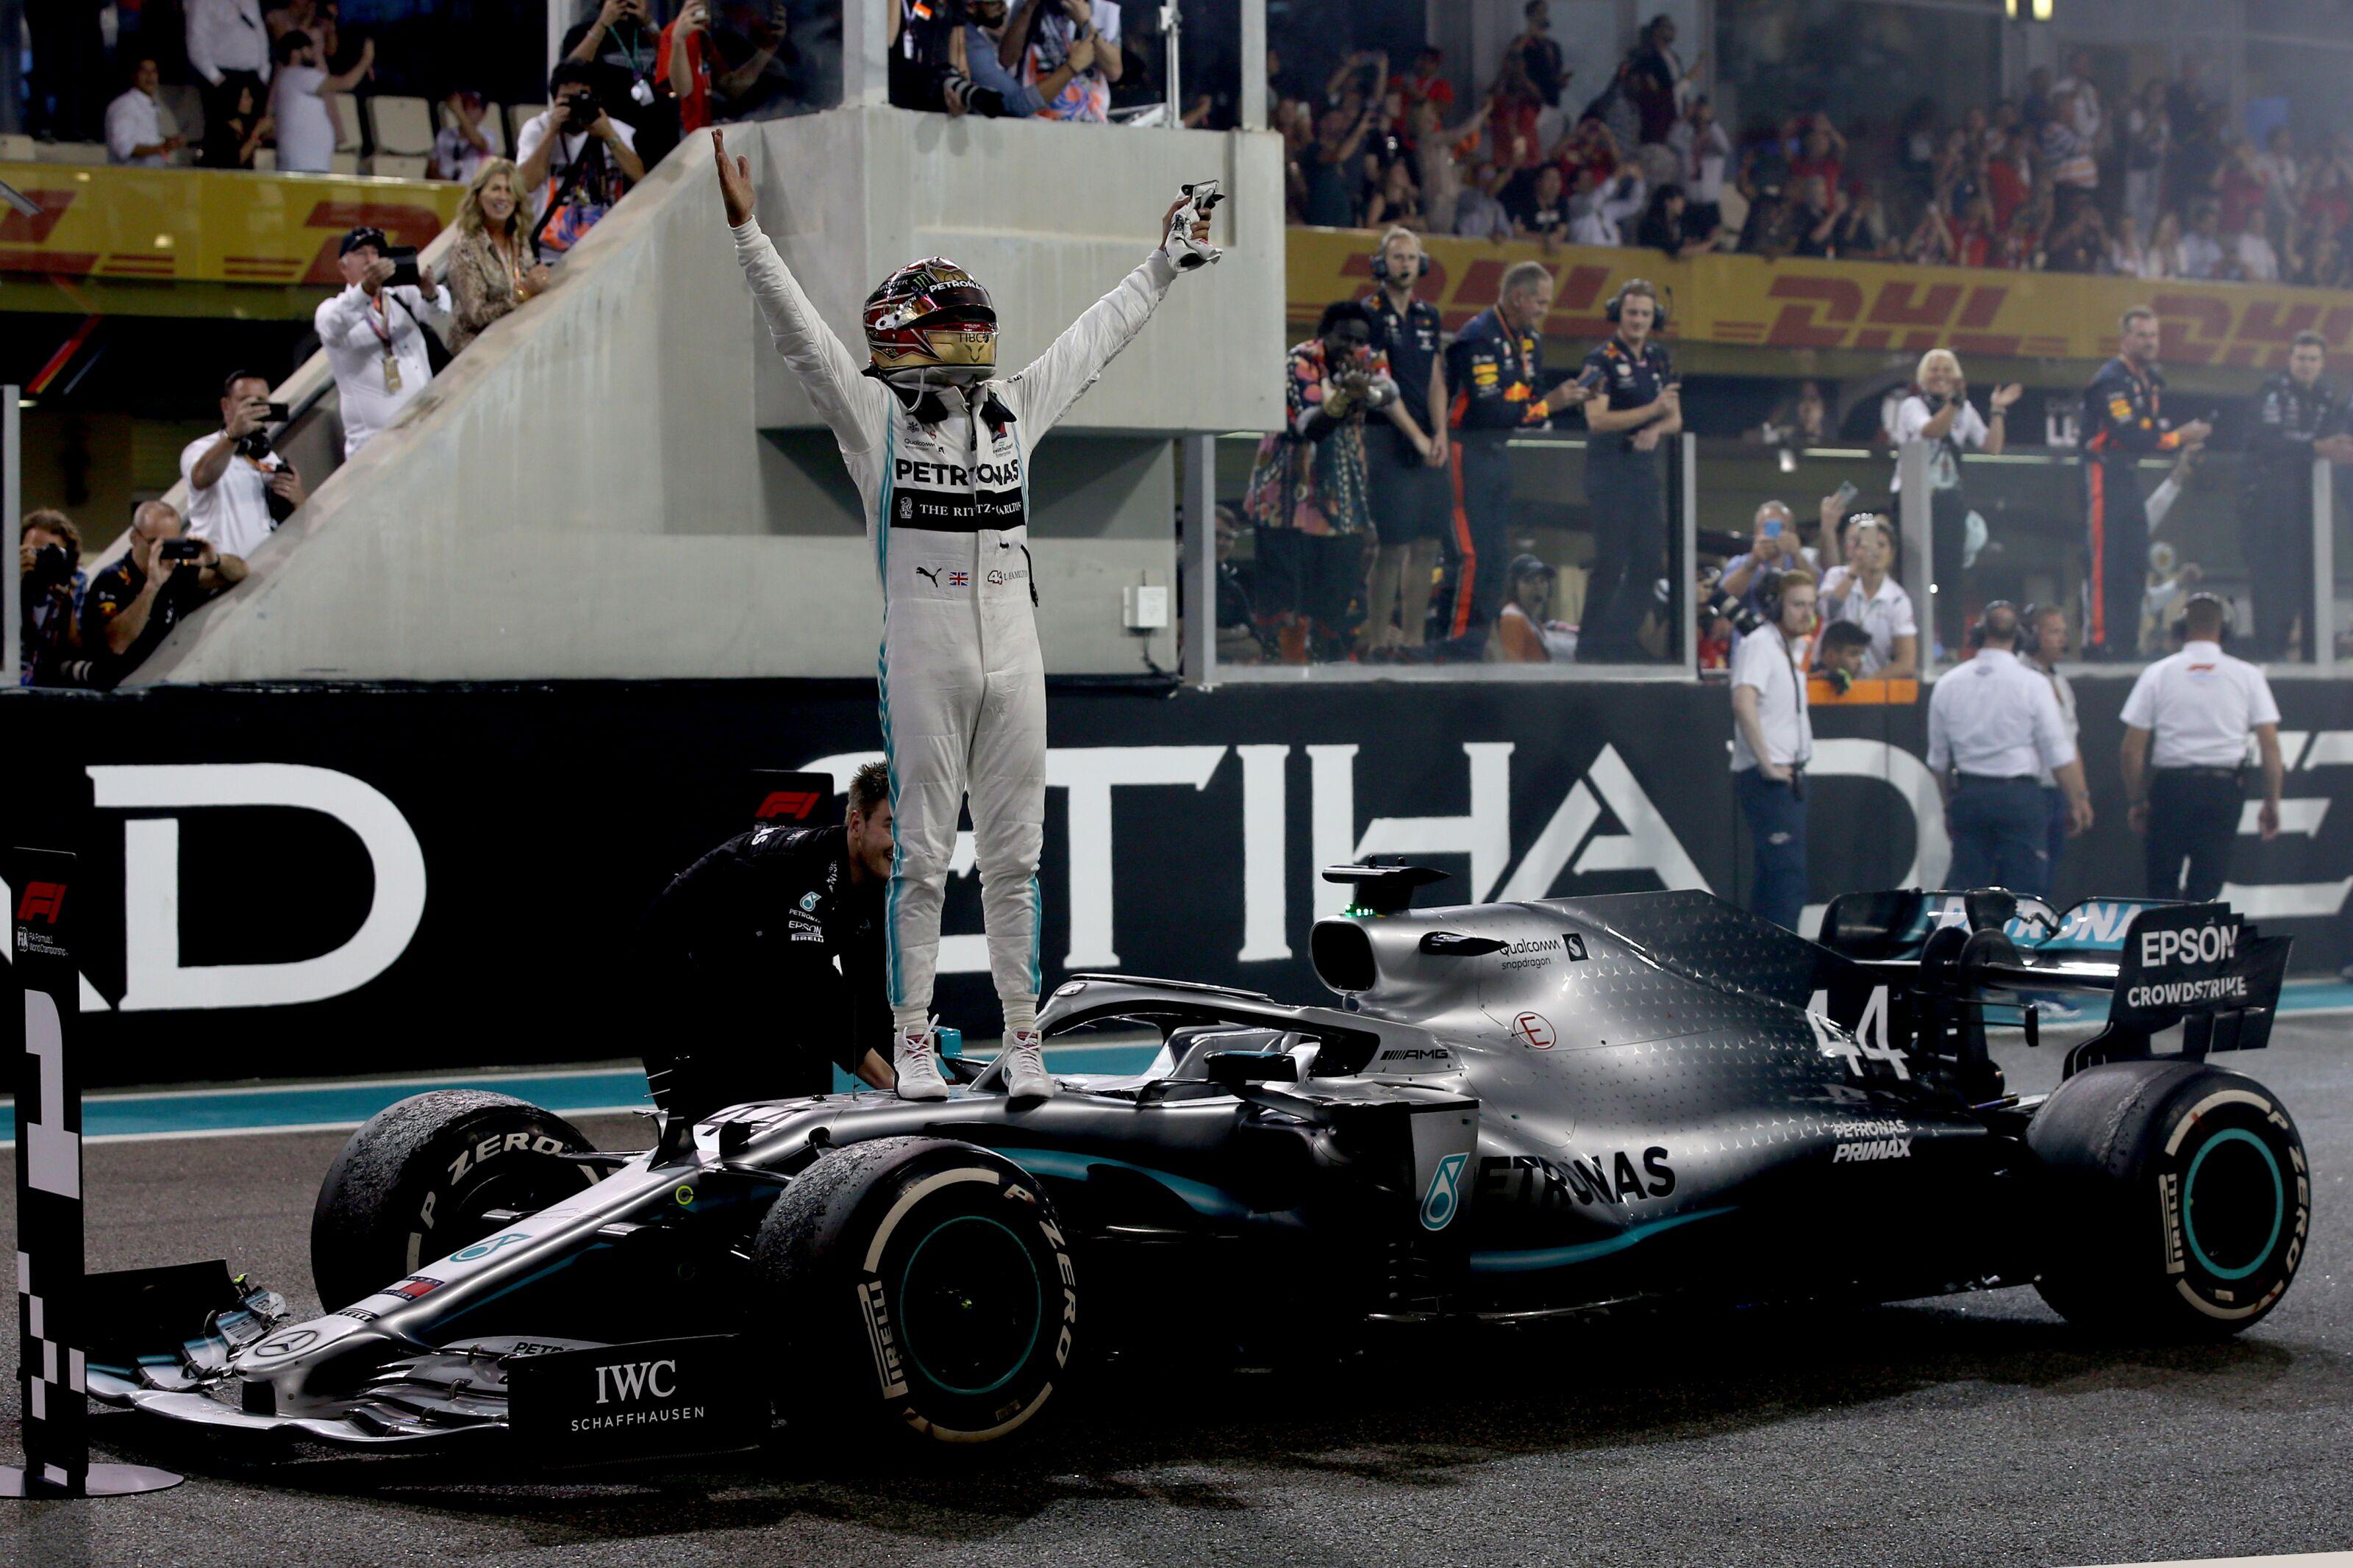 Formula 1: Lewis Hamilton matches Ayrton Senna in Abu Dhabi rout